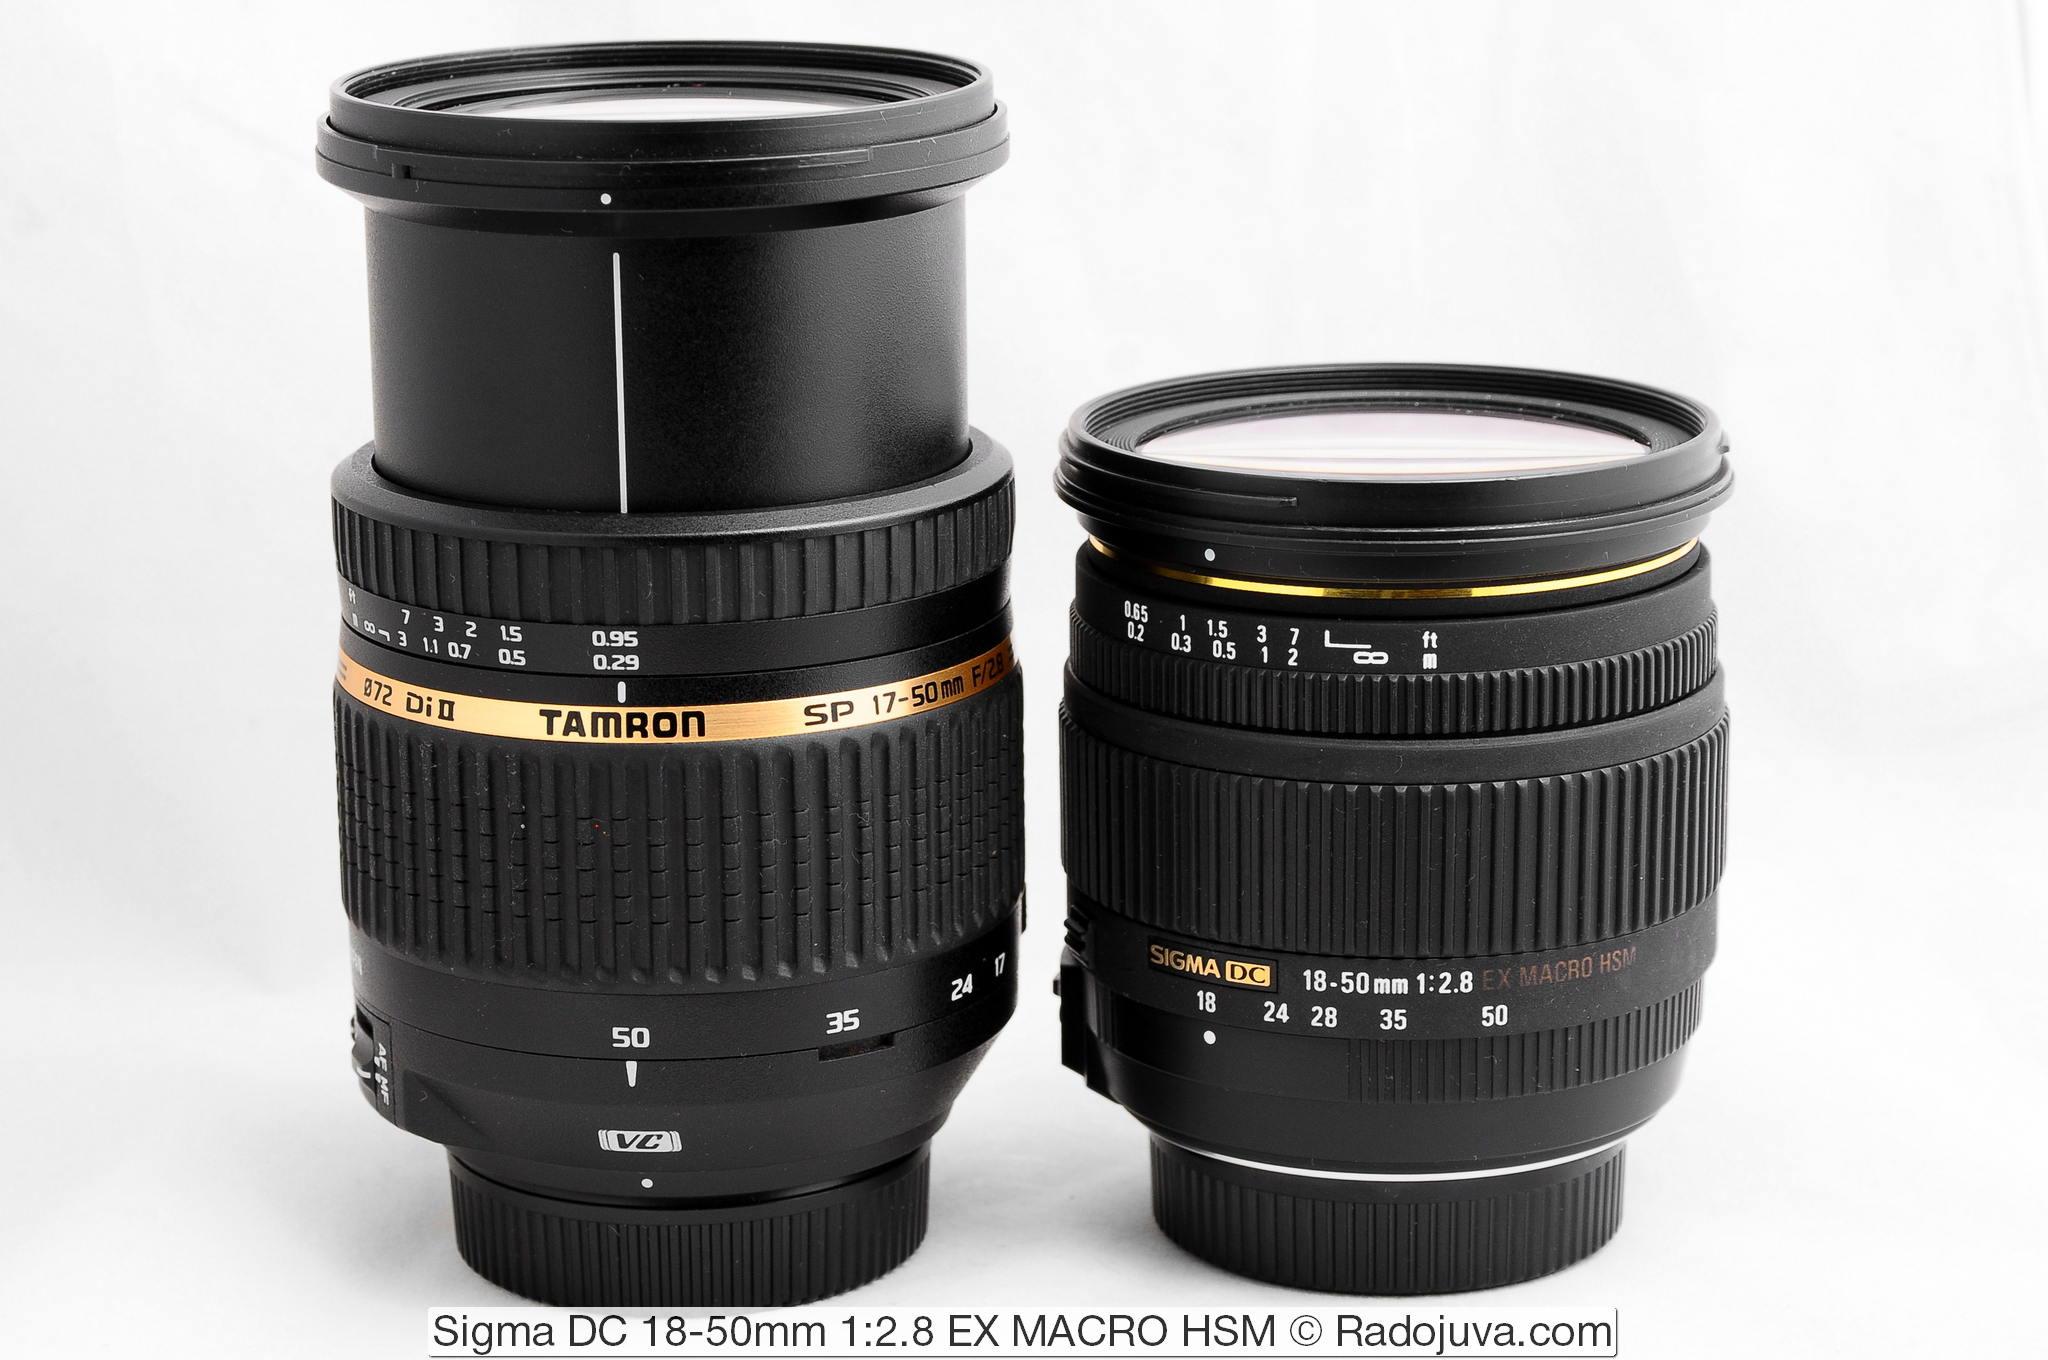 Tamron AF 17-50mm f/2.8 SP XR Di II LD Aspherical [IF] VC B005 и Sigma DC 18-50mm 1:2.8 EX MACRO HSM